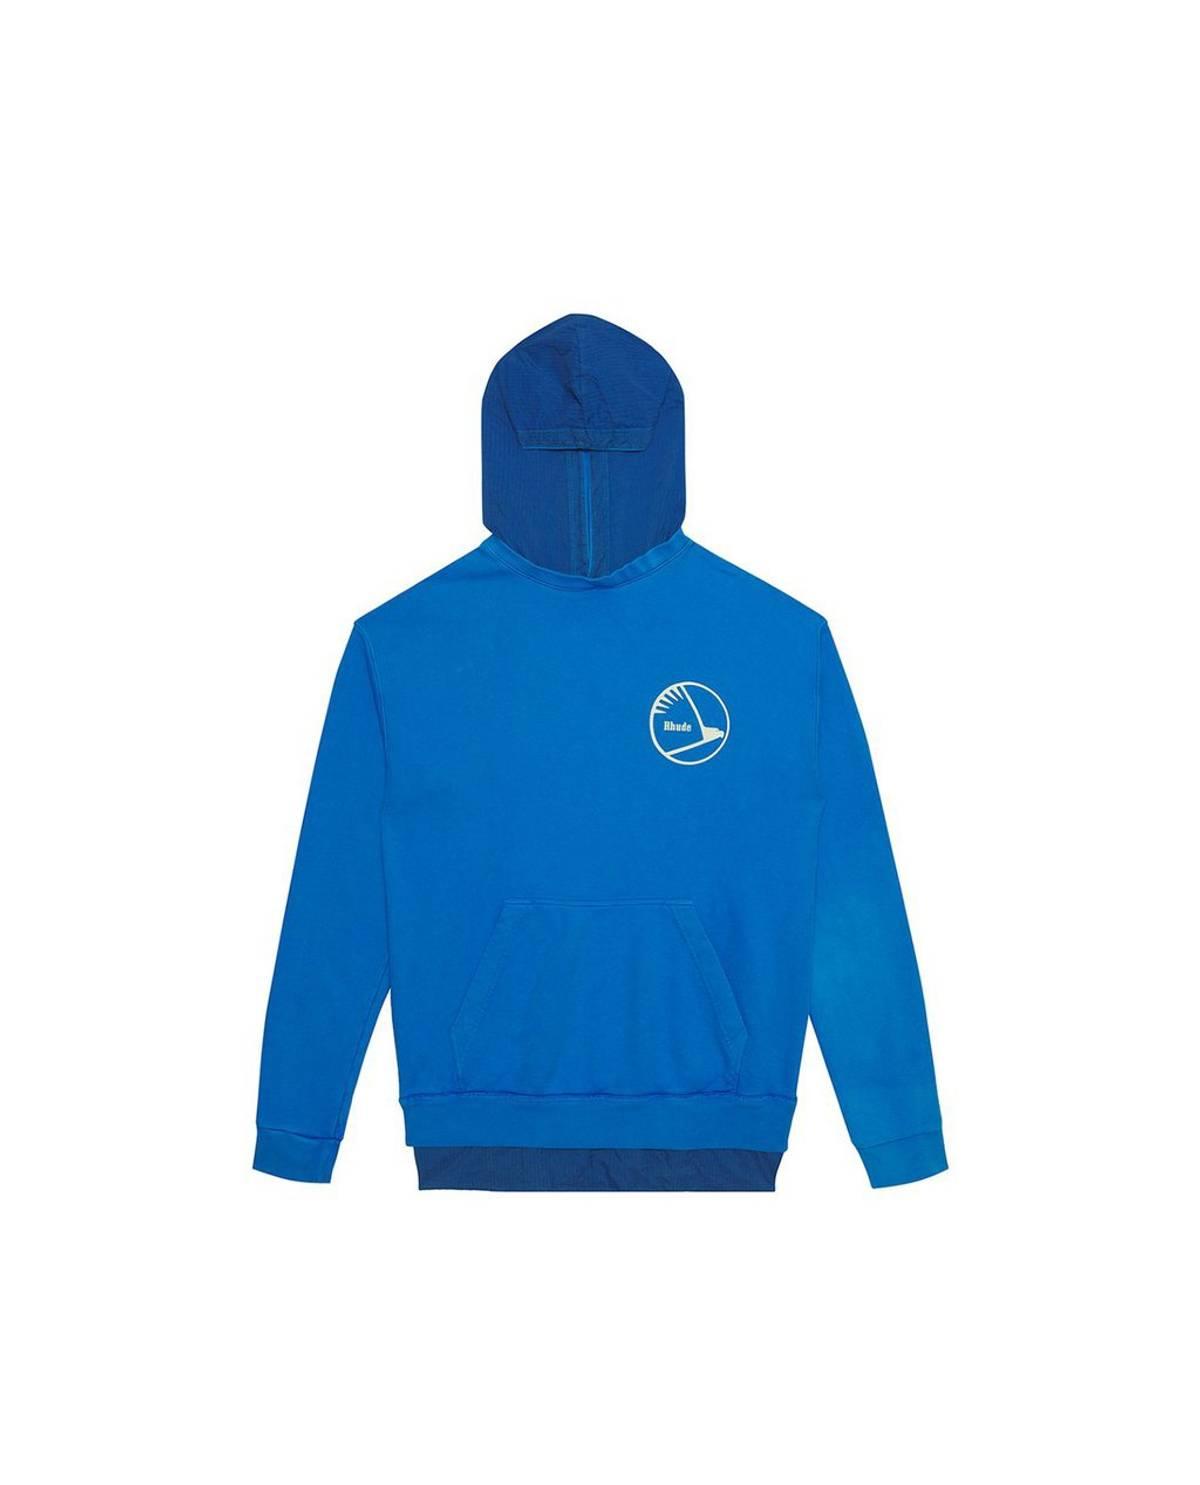 Rhude Rhude Layered French Terry Nylon Hoodie Blue Size Xl $194